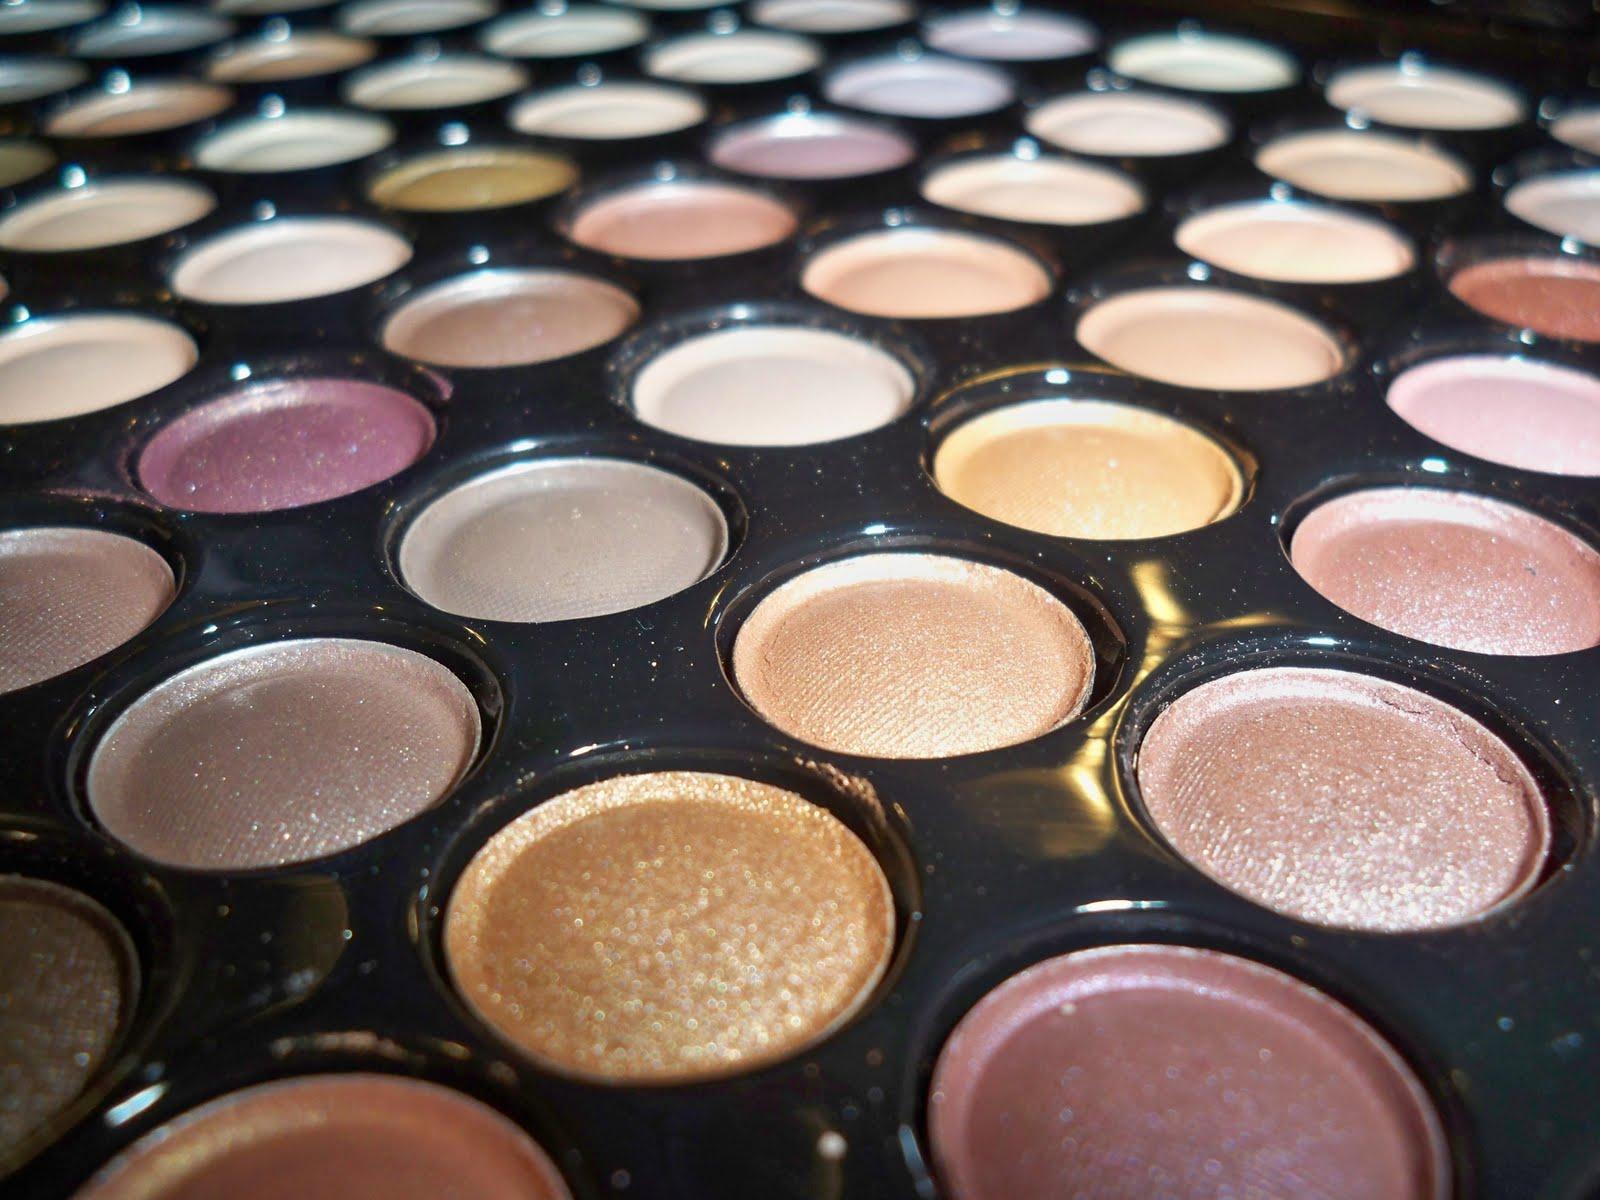 ... Natural Nude Warm Makeup Set High Pigment Make Up Palette BNIB | eBay